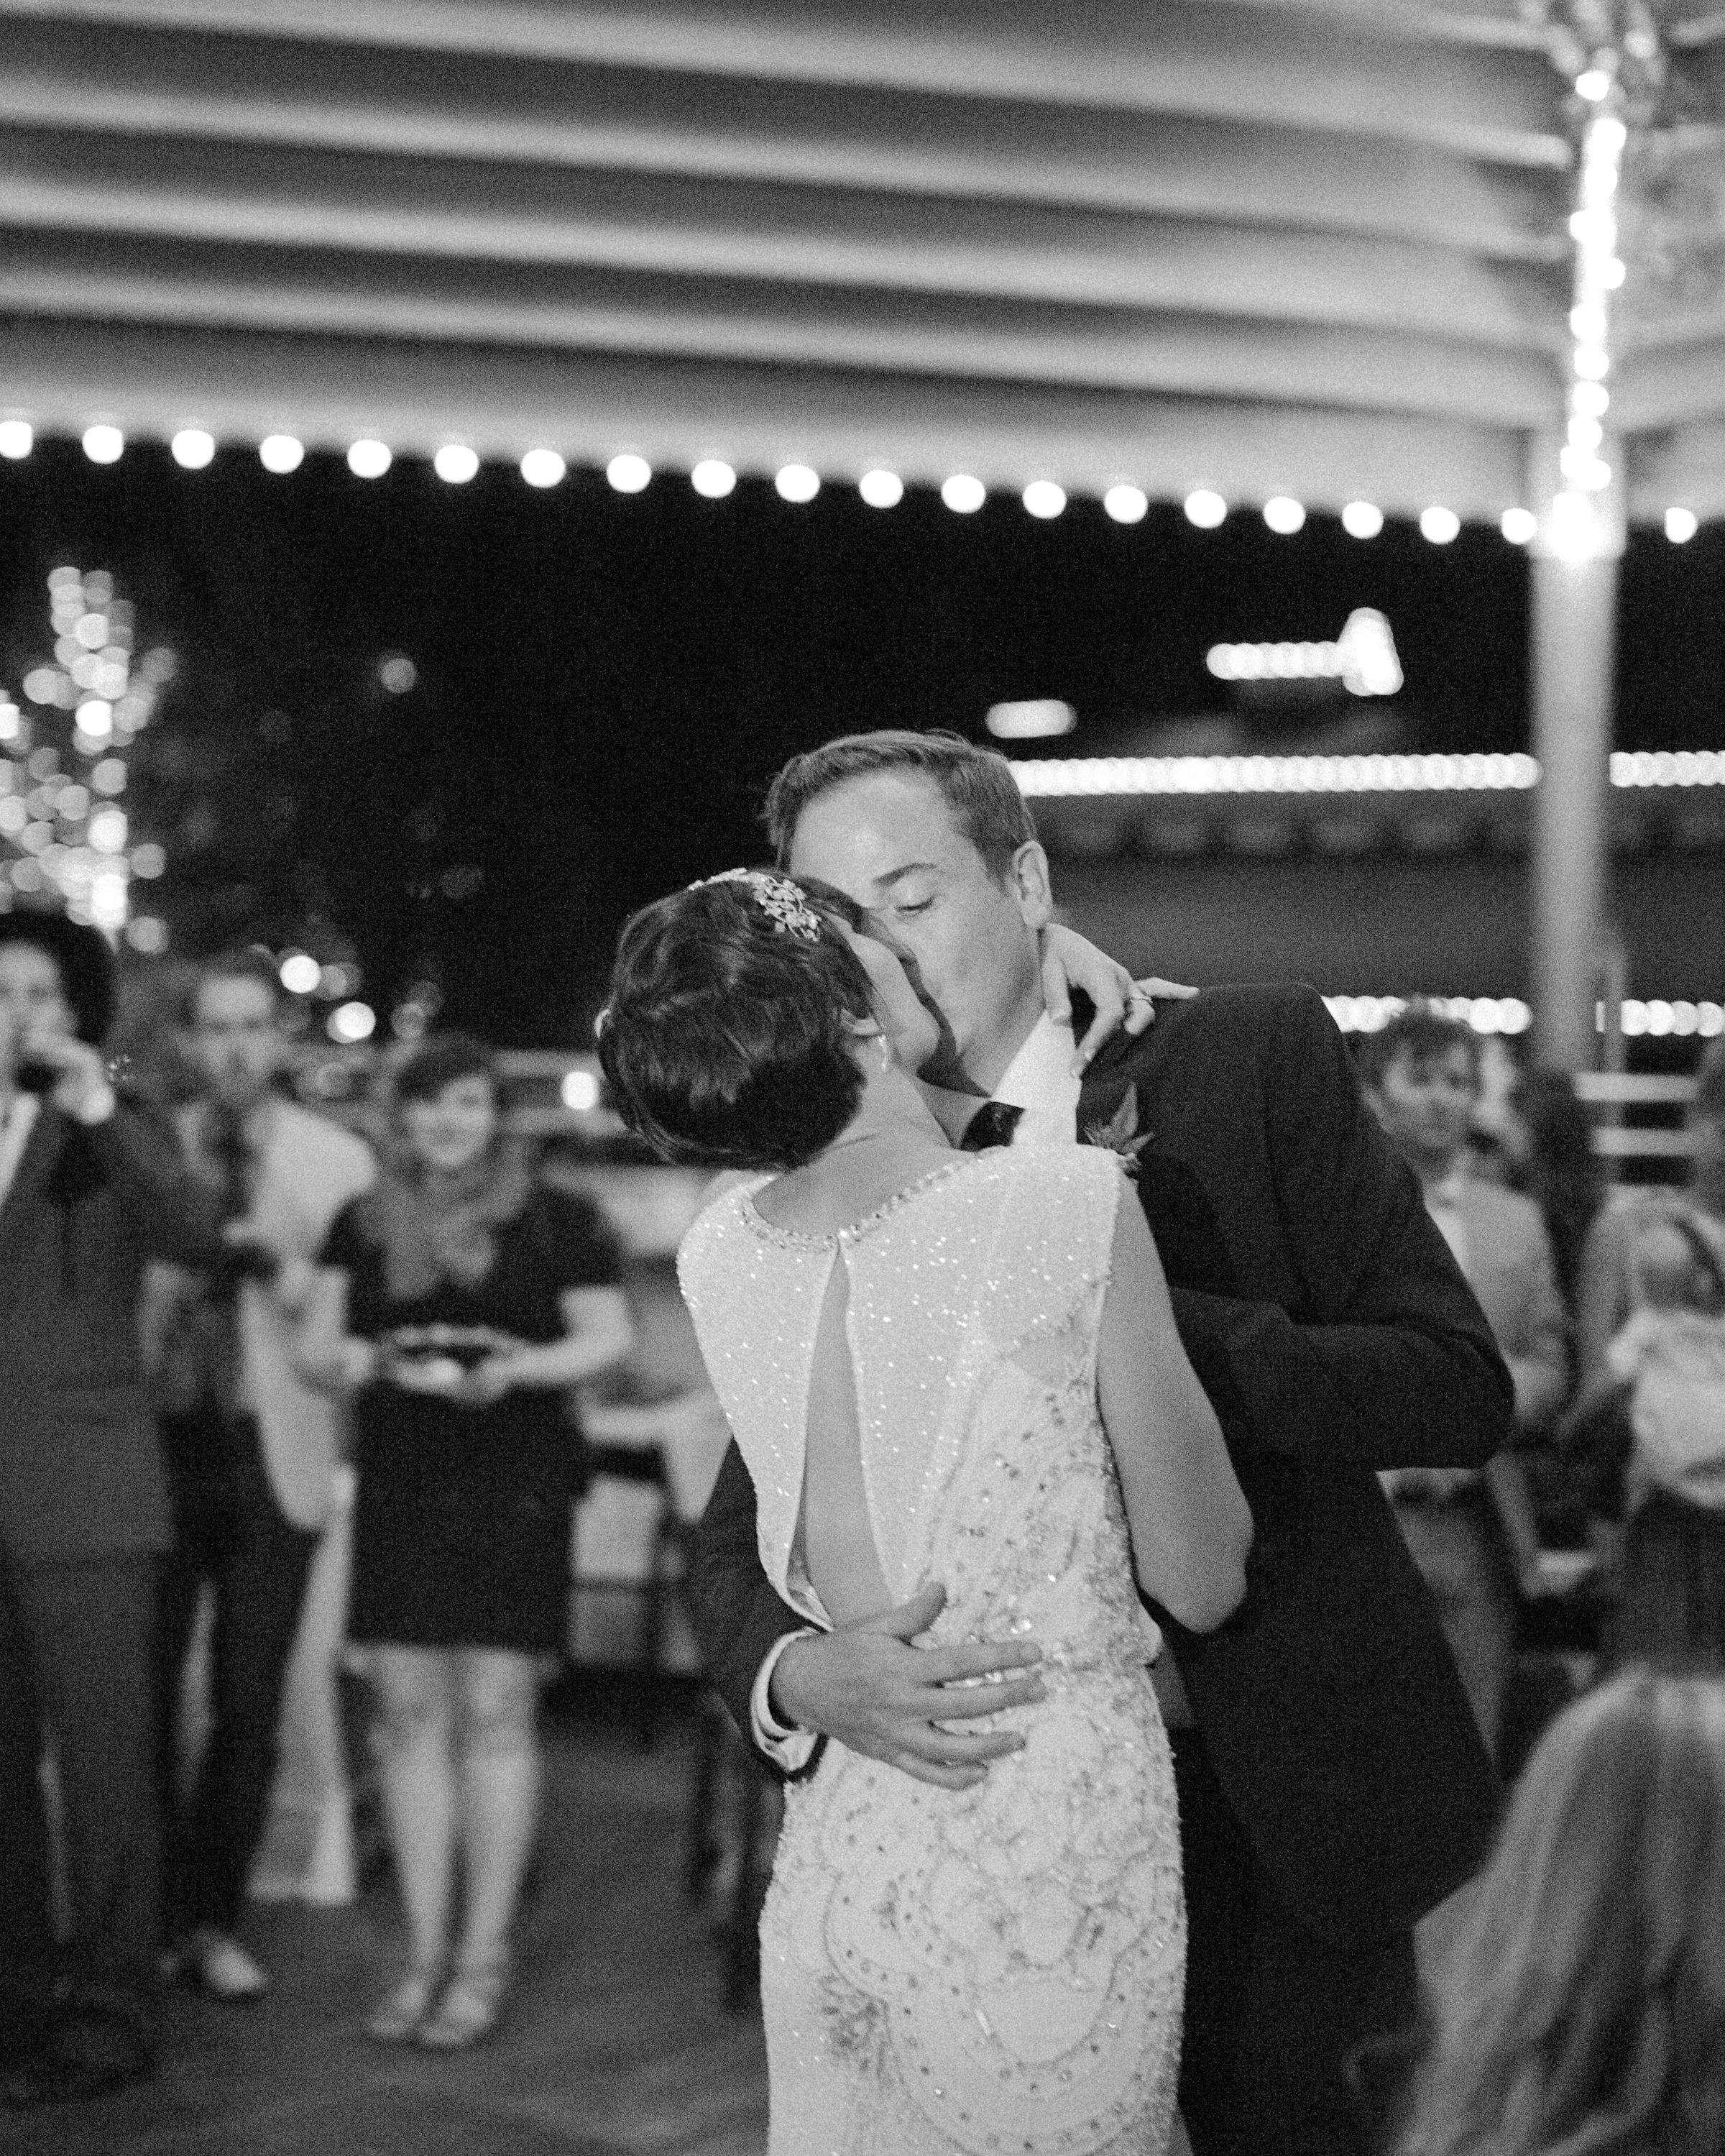 lizzy-pat-wedding-dance-196-s111777-0115.jpg